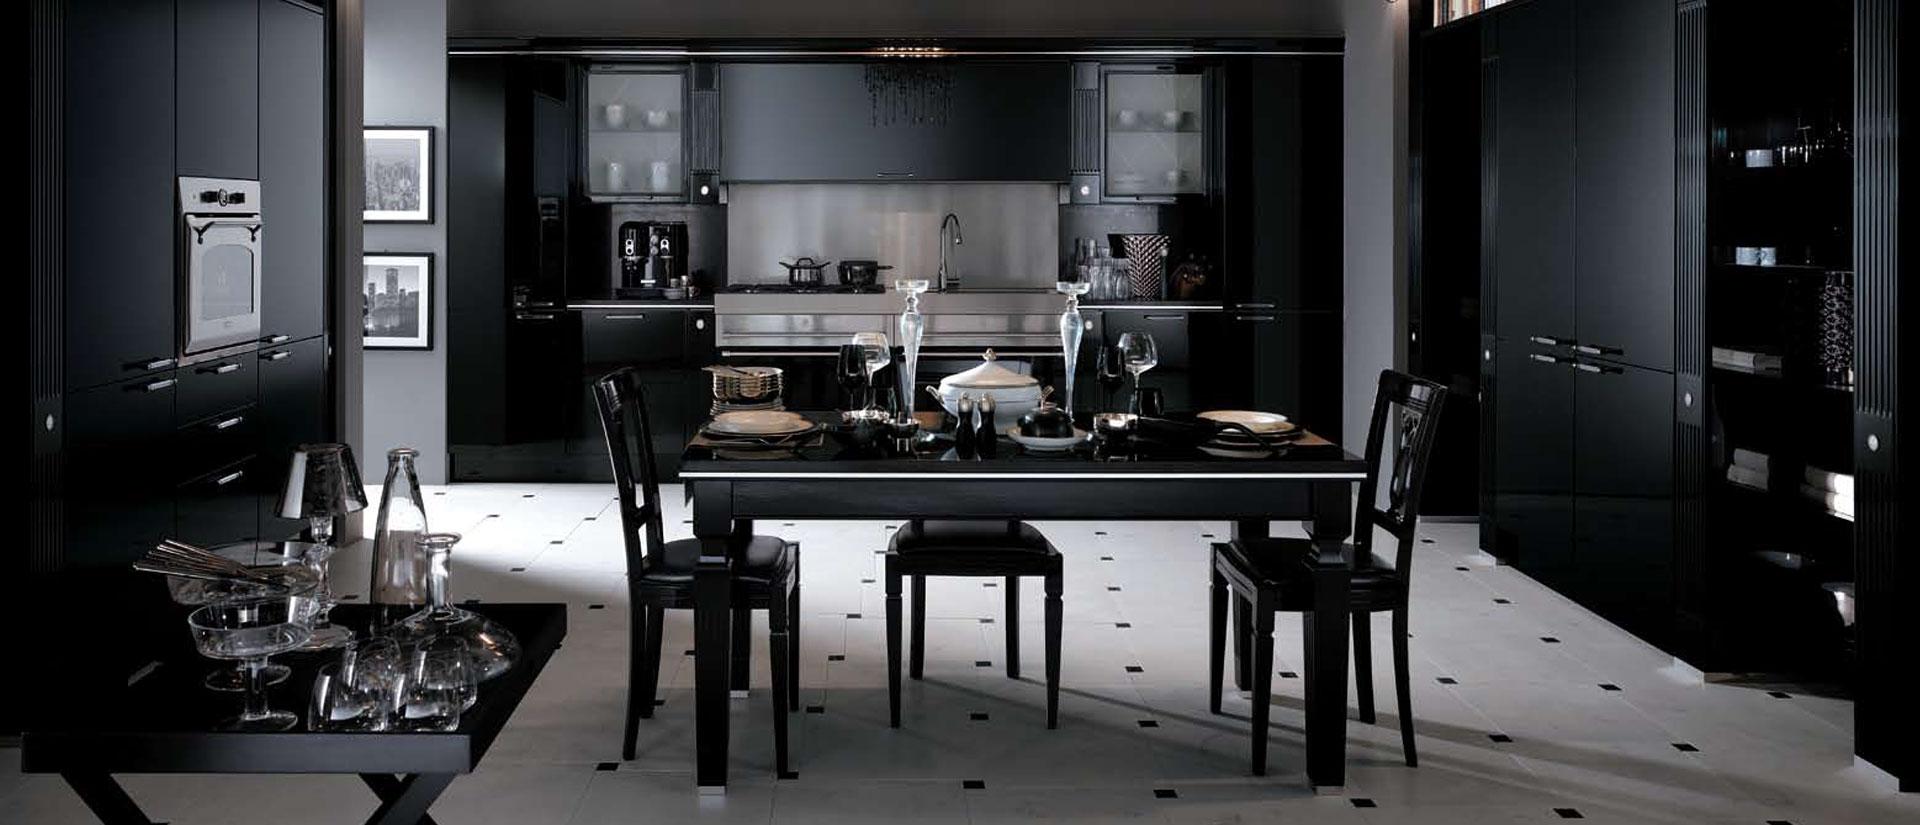 Cucina Scavolini Baccarat La Piu Raffinata Scheda Approfondita